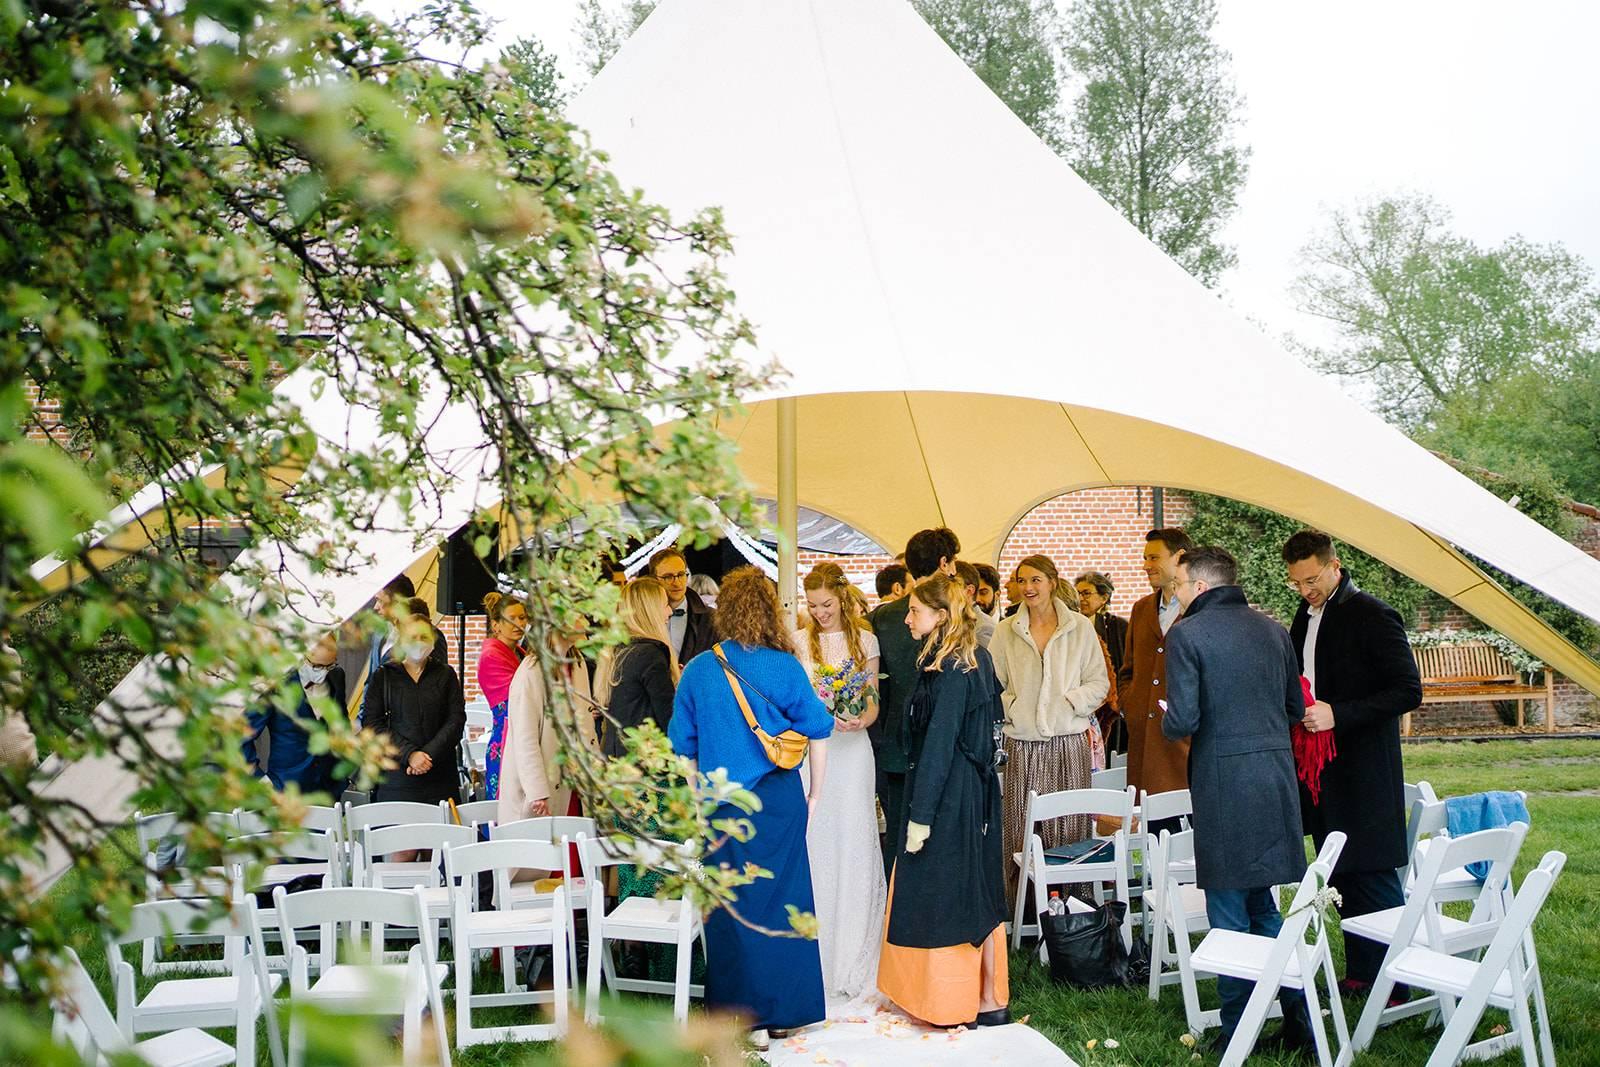 Hilde Eyckmans - Anouk&Bart - Hilde Eyckmans - ceremonie-117 - House of Weddings